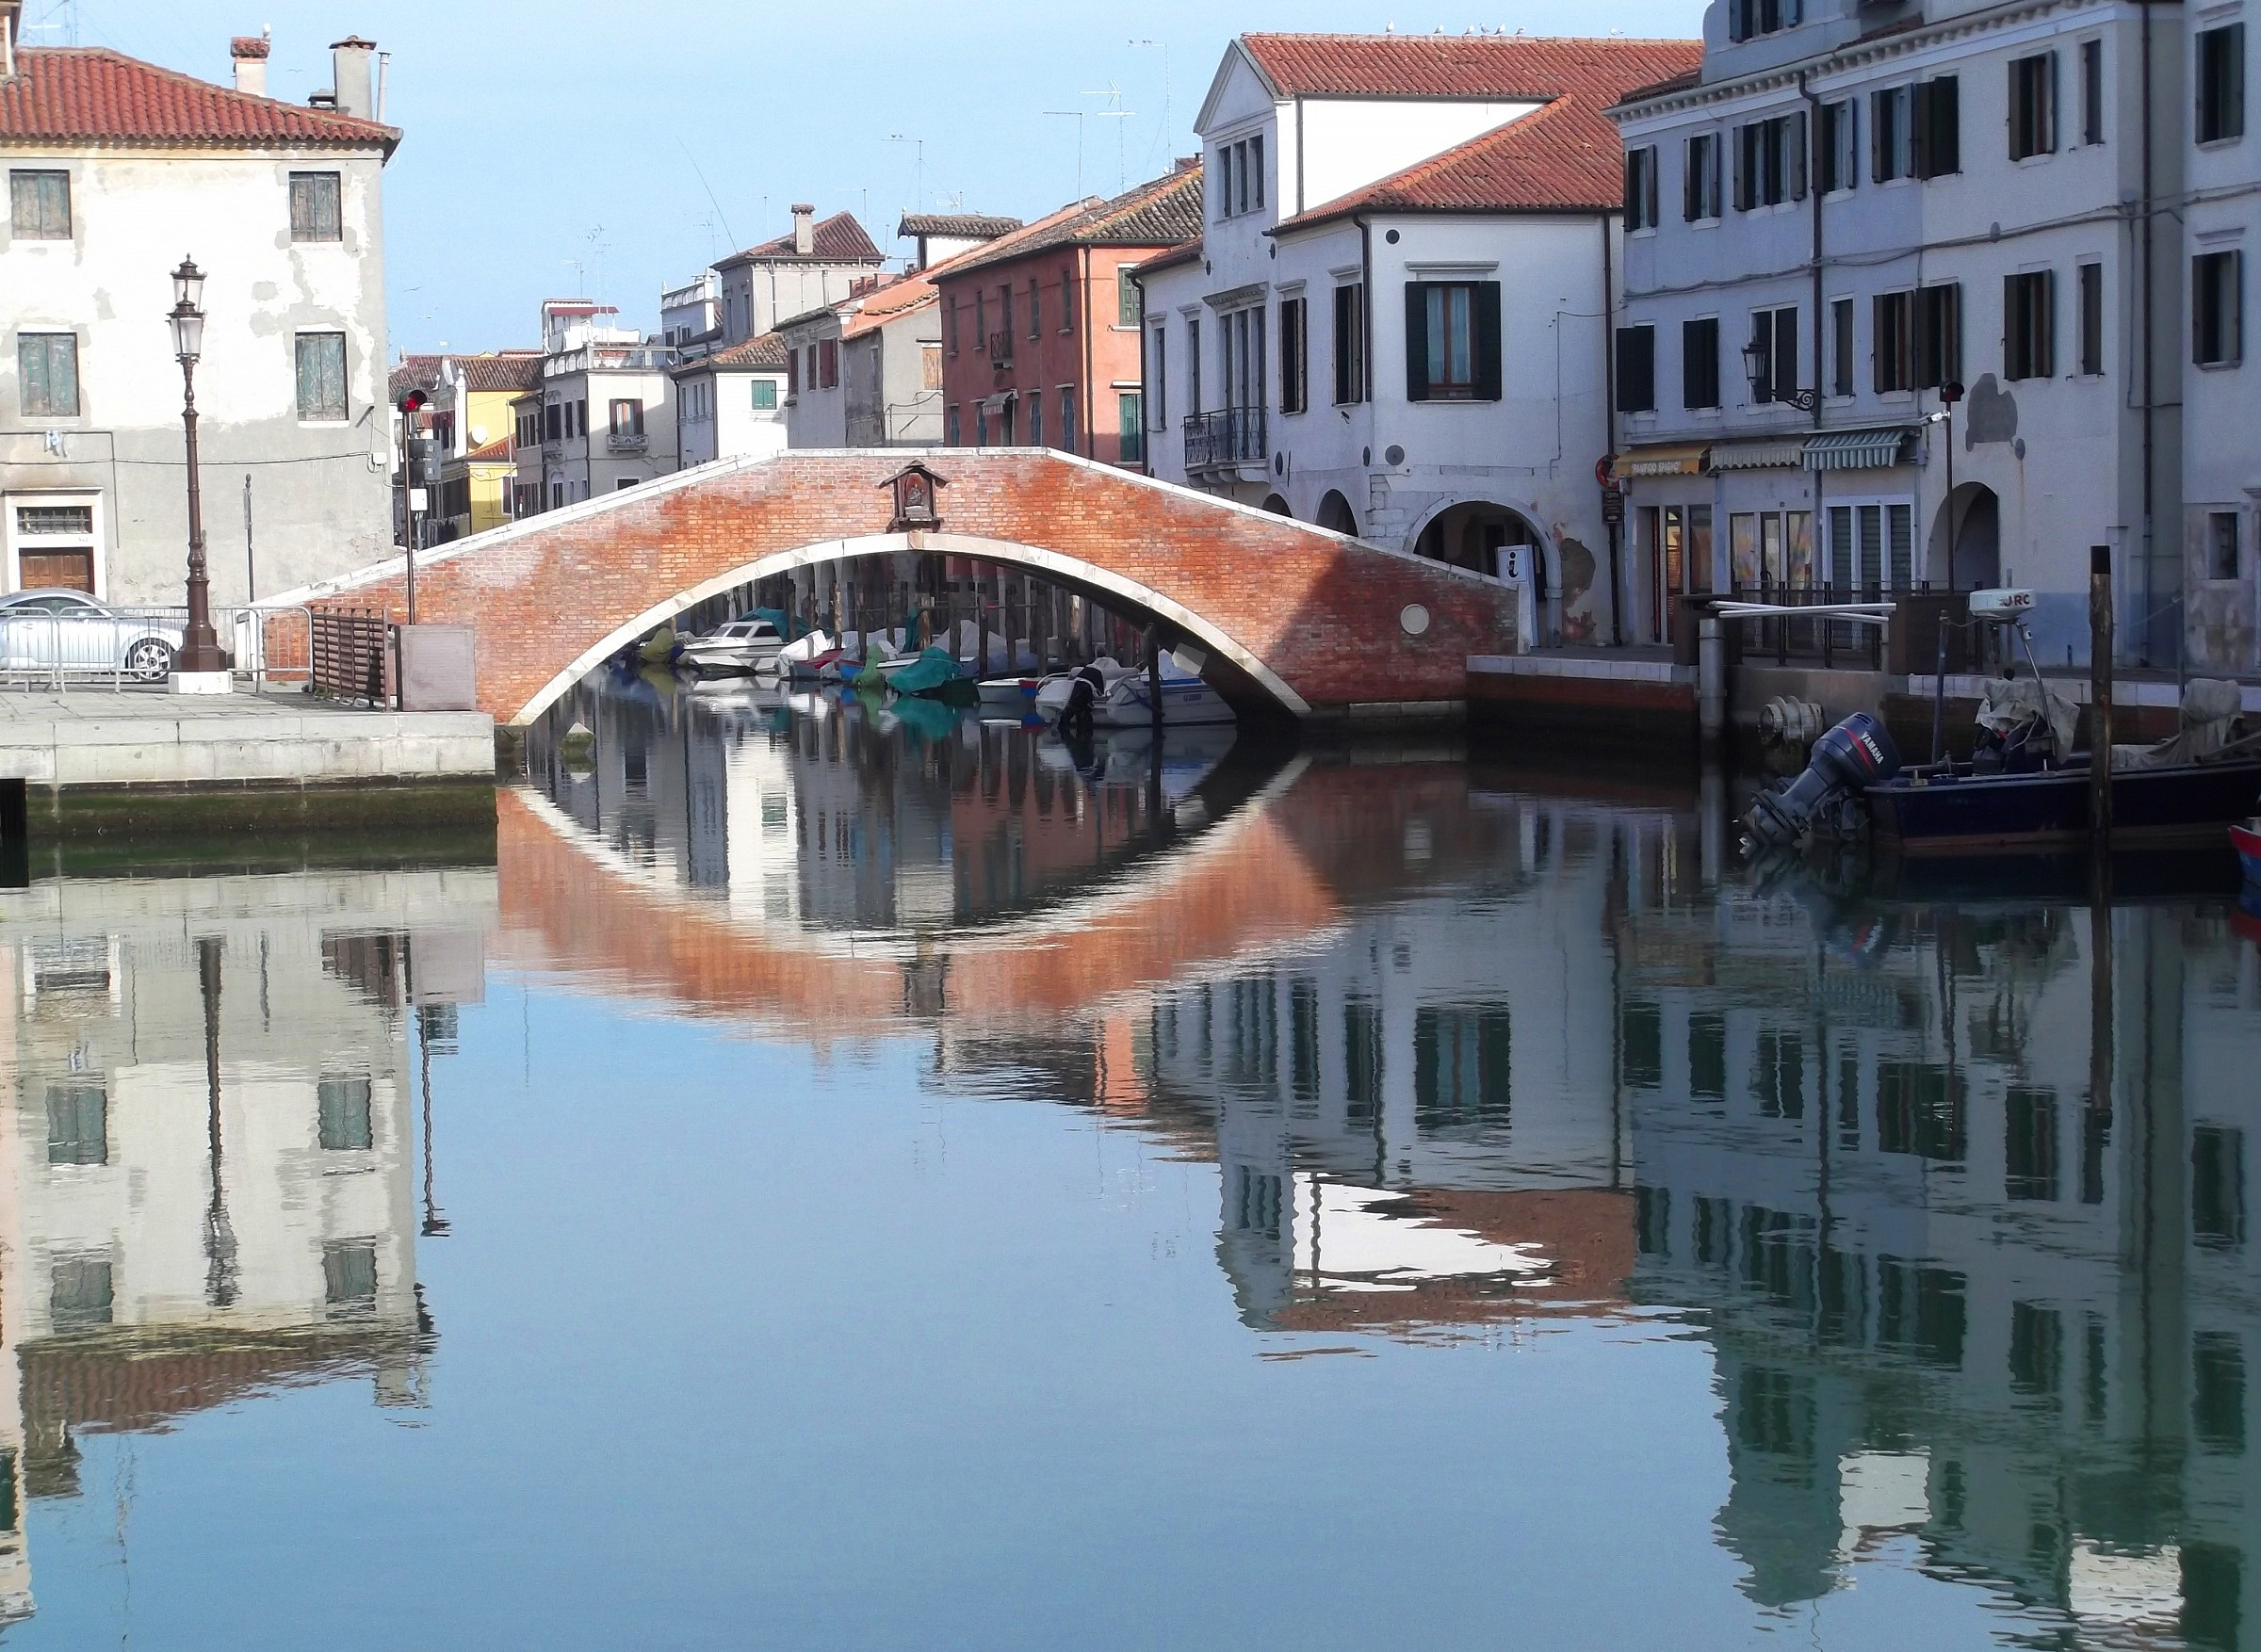 The bridges...